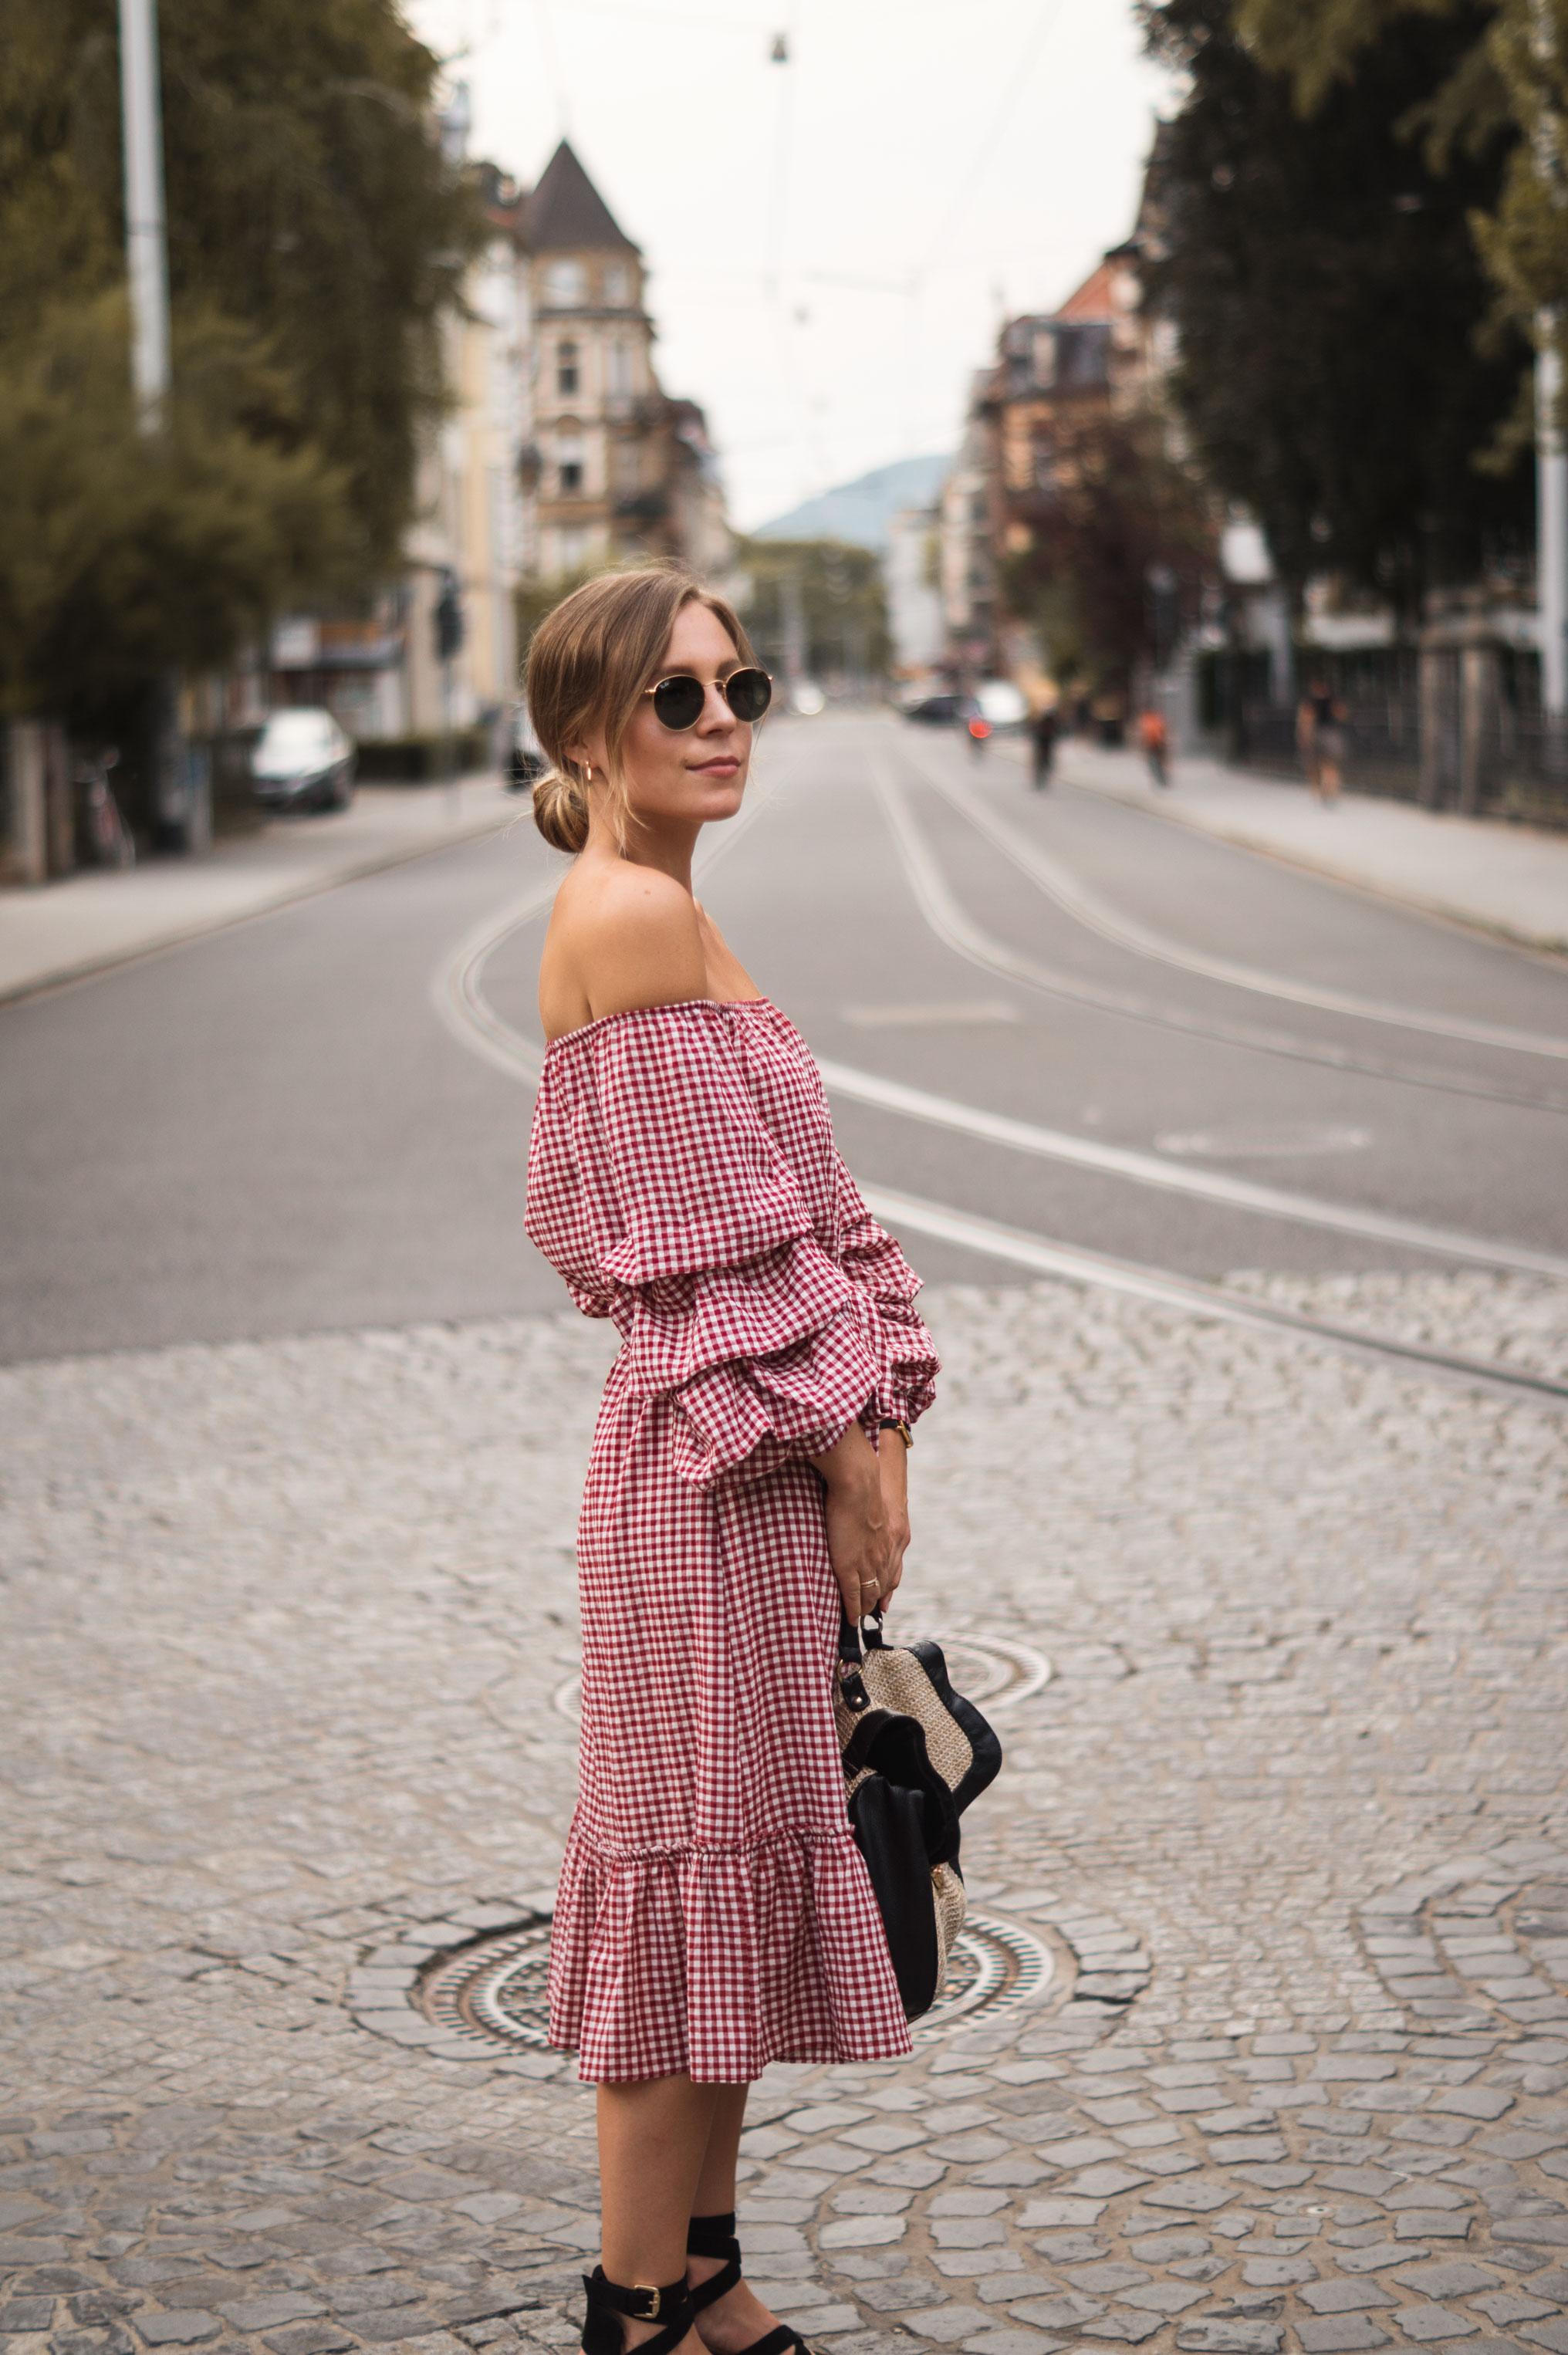 rotes Karokleid Zara off shoulder gingham Streetstyle Heidelberg Sariety Modeblog Fashionblogger-4